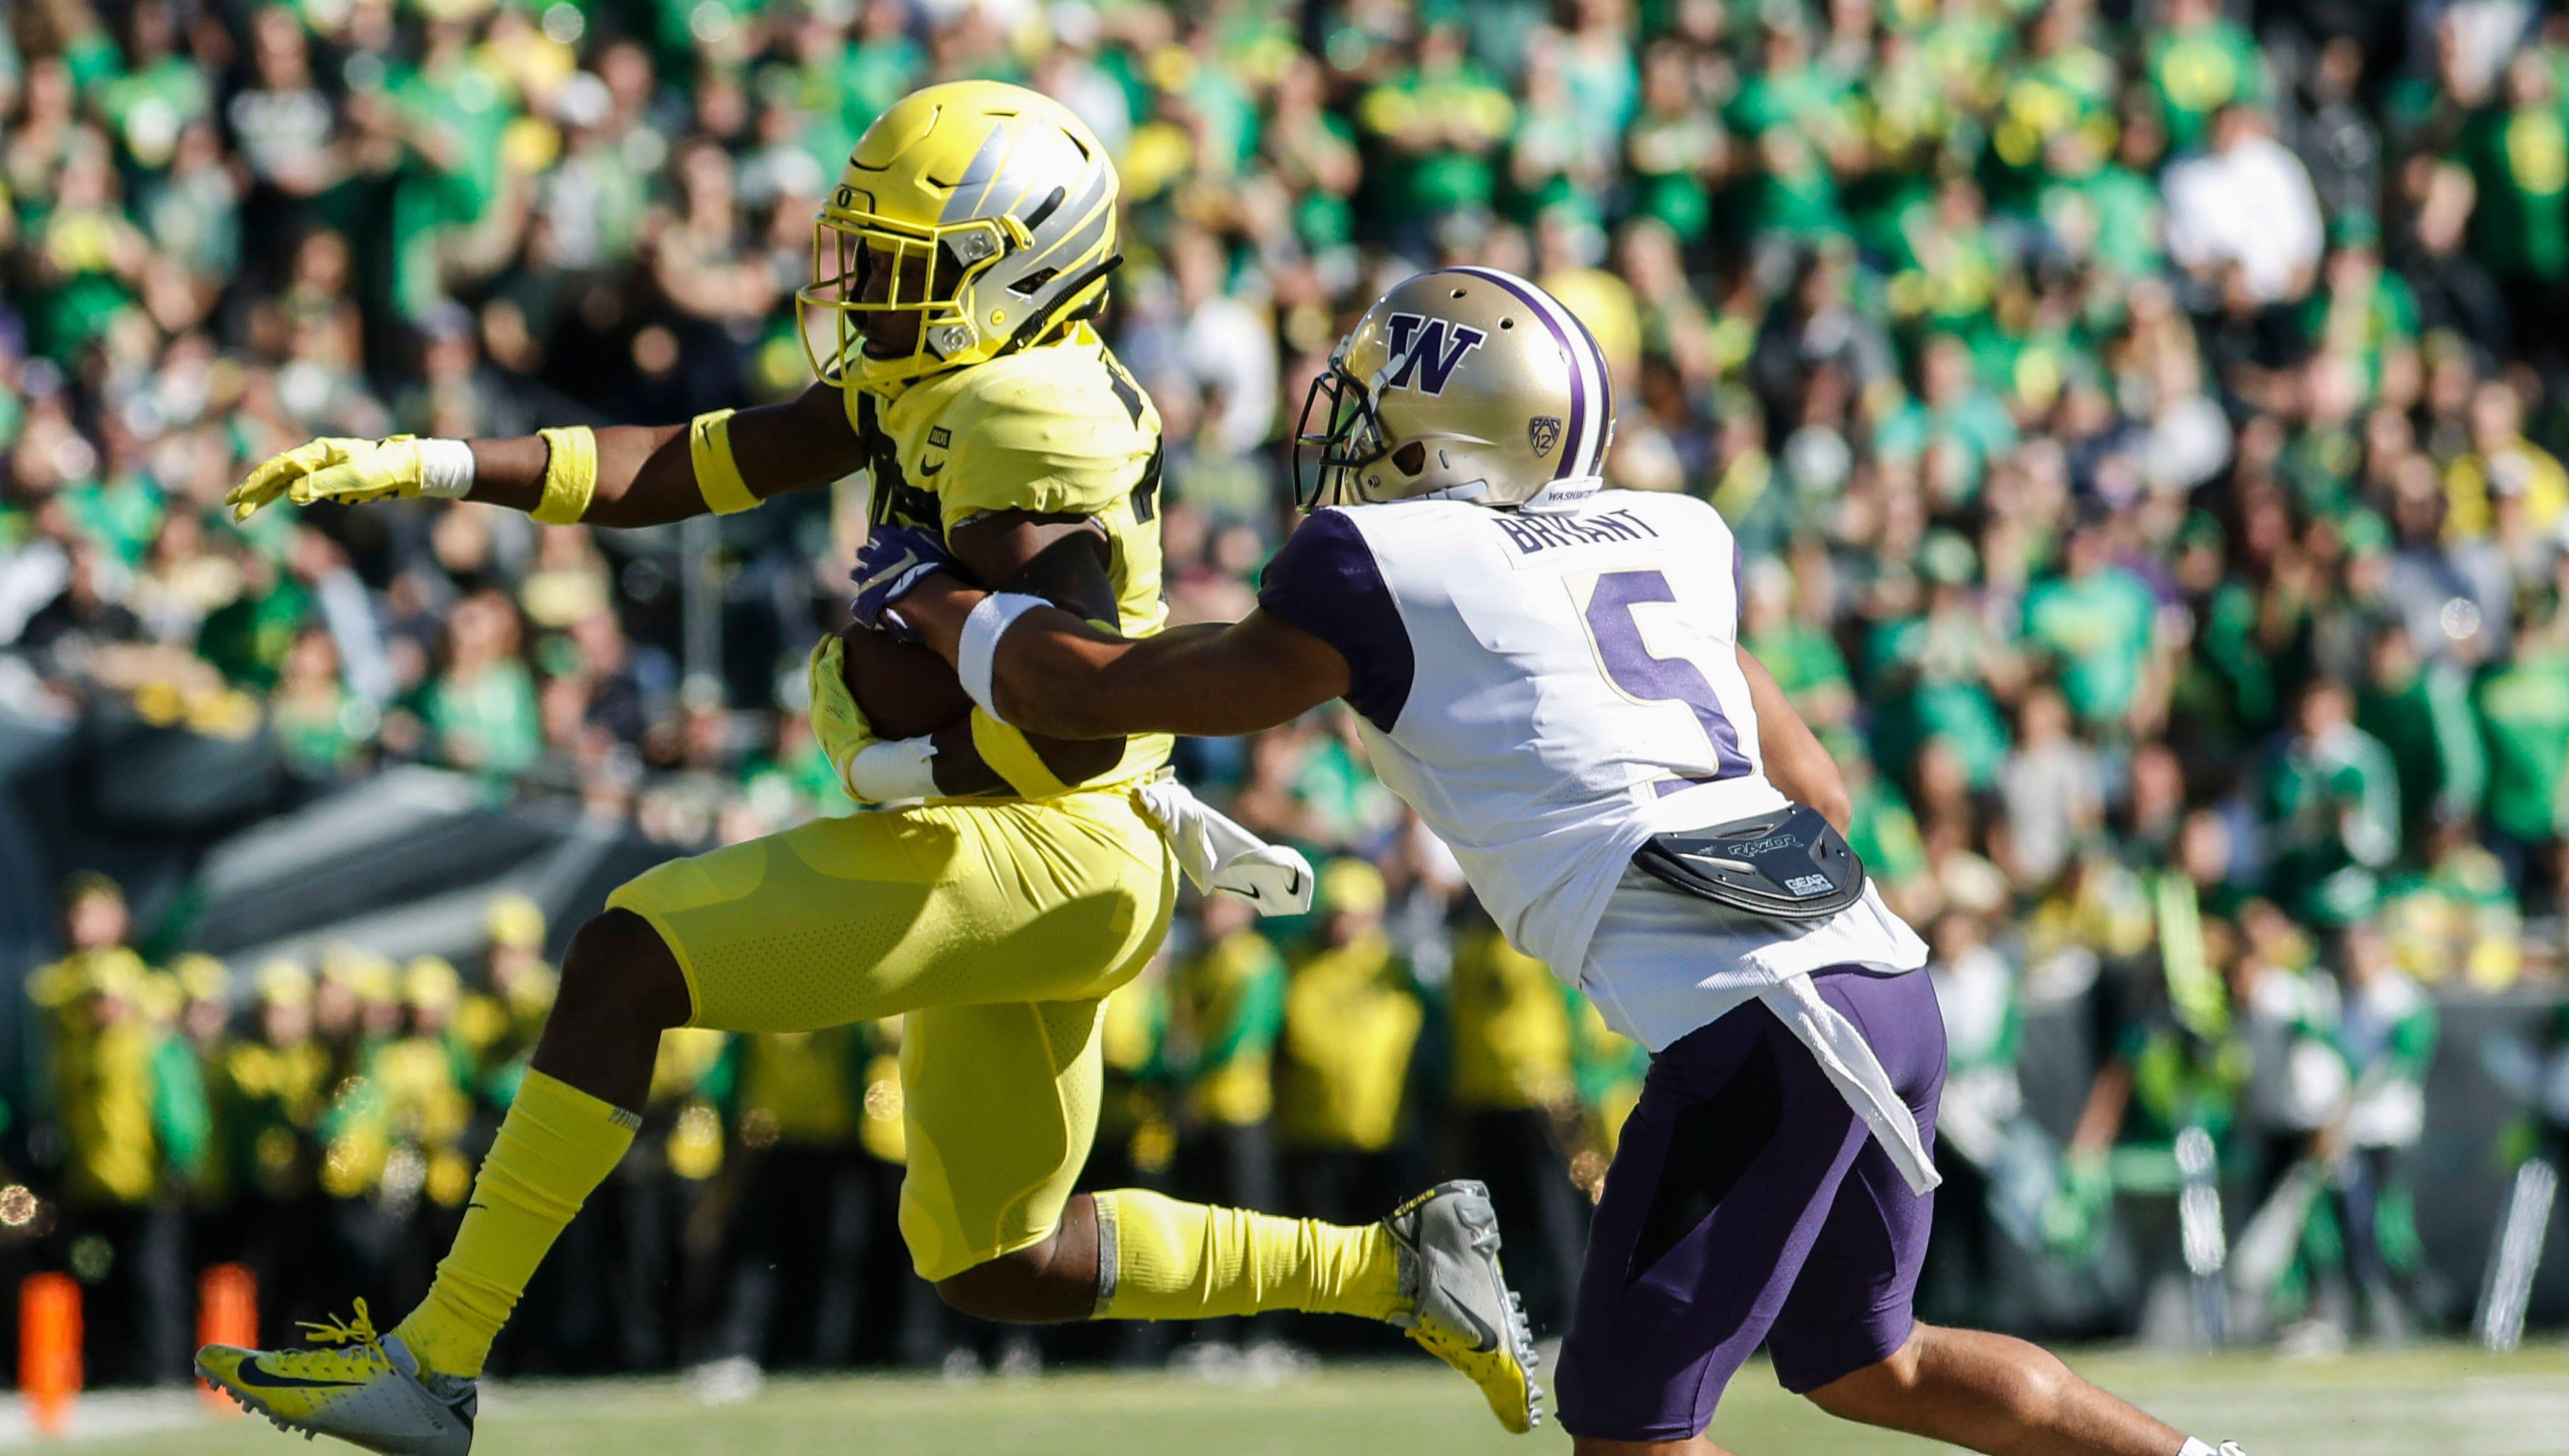 Oregon wide receiver Jaylon Redd (30), outruns Washington defensive back Myles Bryant (5).